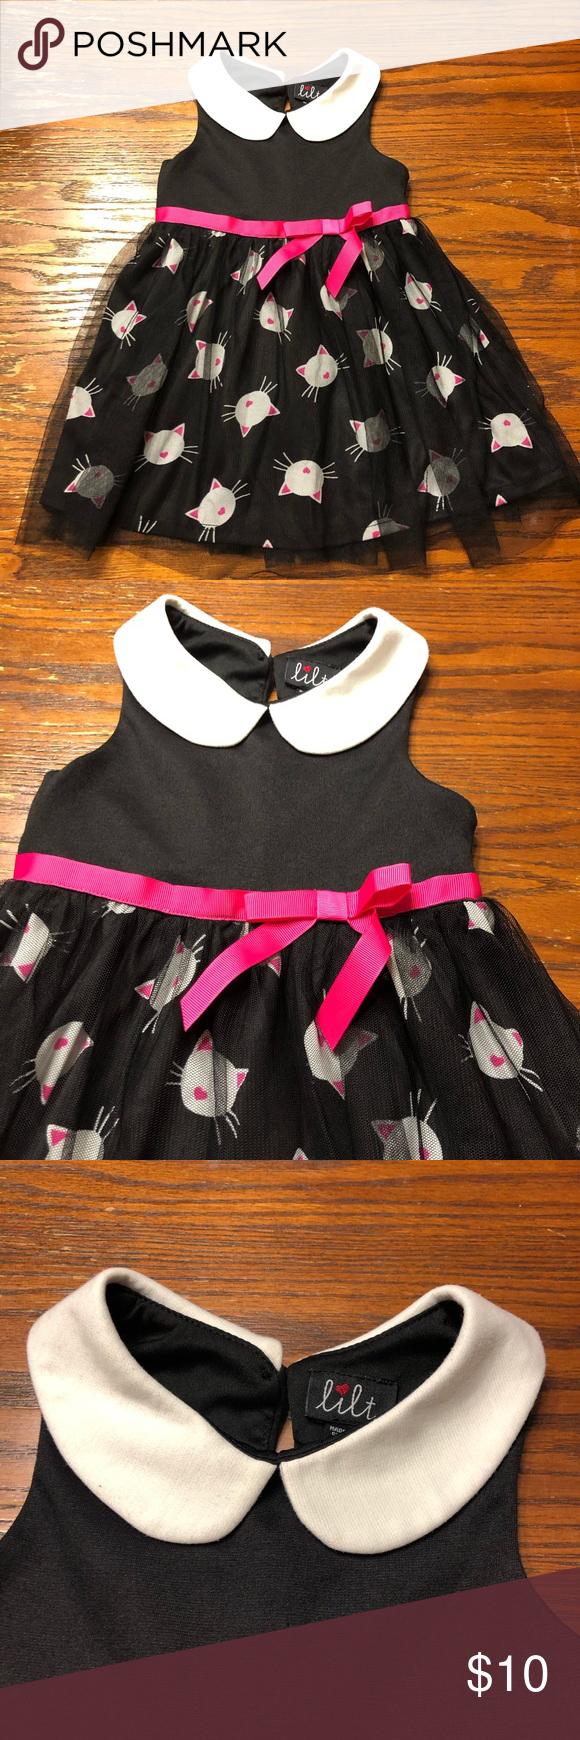 Lilt Nwot Black Sleeveless Dress Size 3t Black Sleeveless Dress Black Sleeveless Dresses [ 1740 x 580 Pixel ]